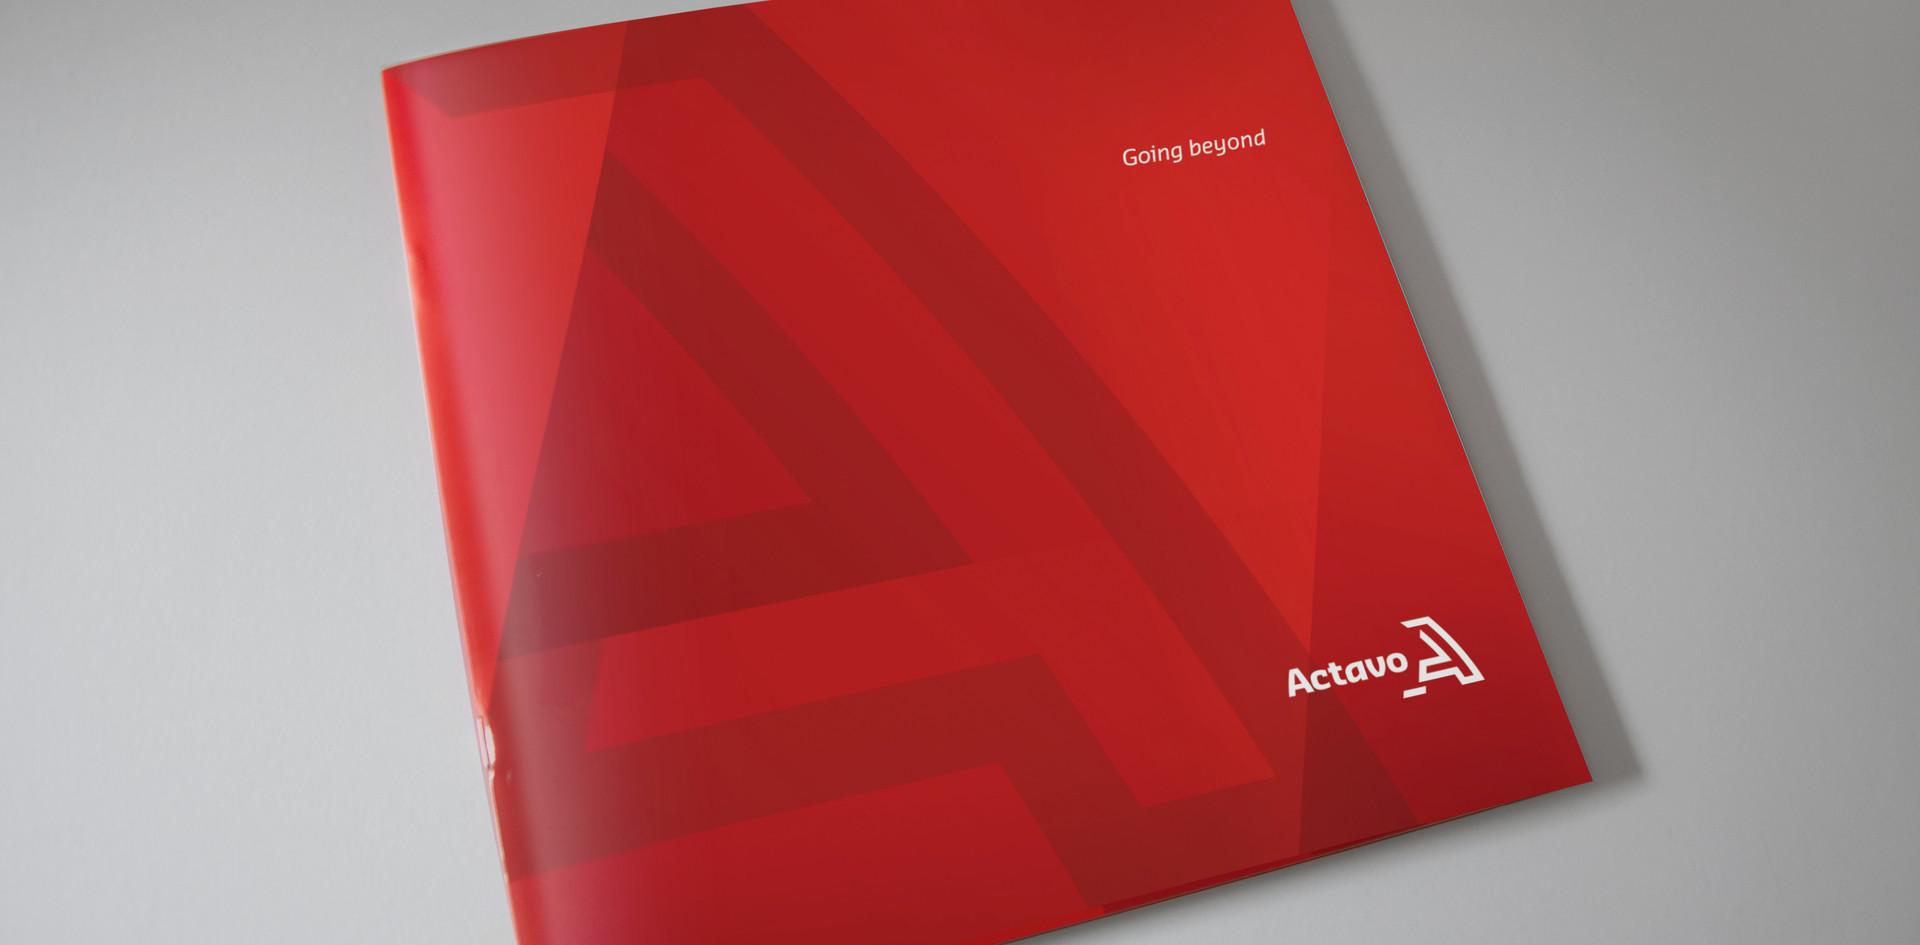 Actavo Sky Presentation Square Brochure